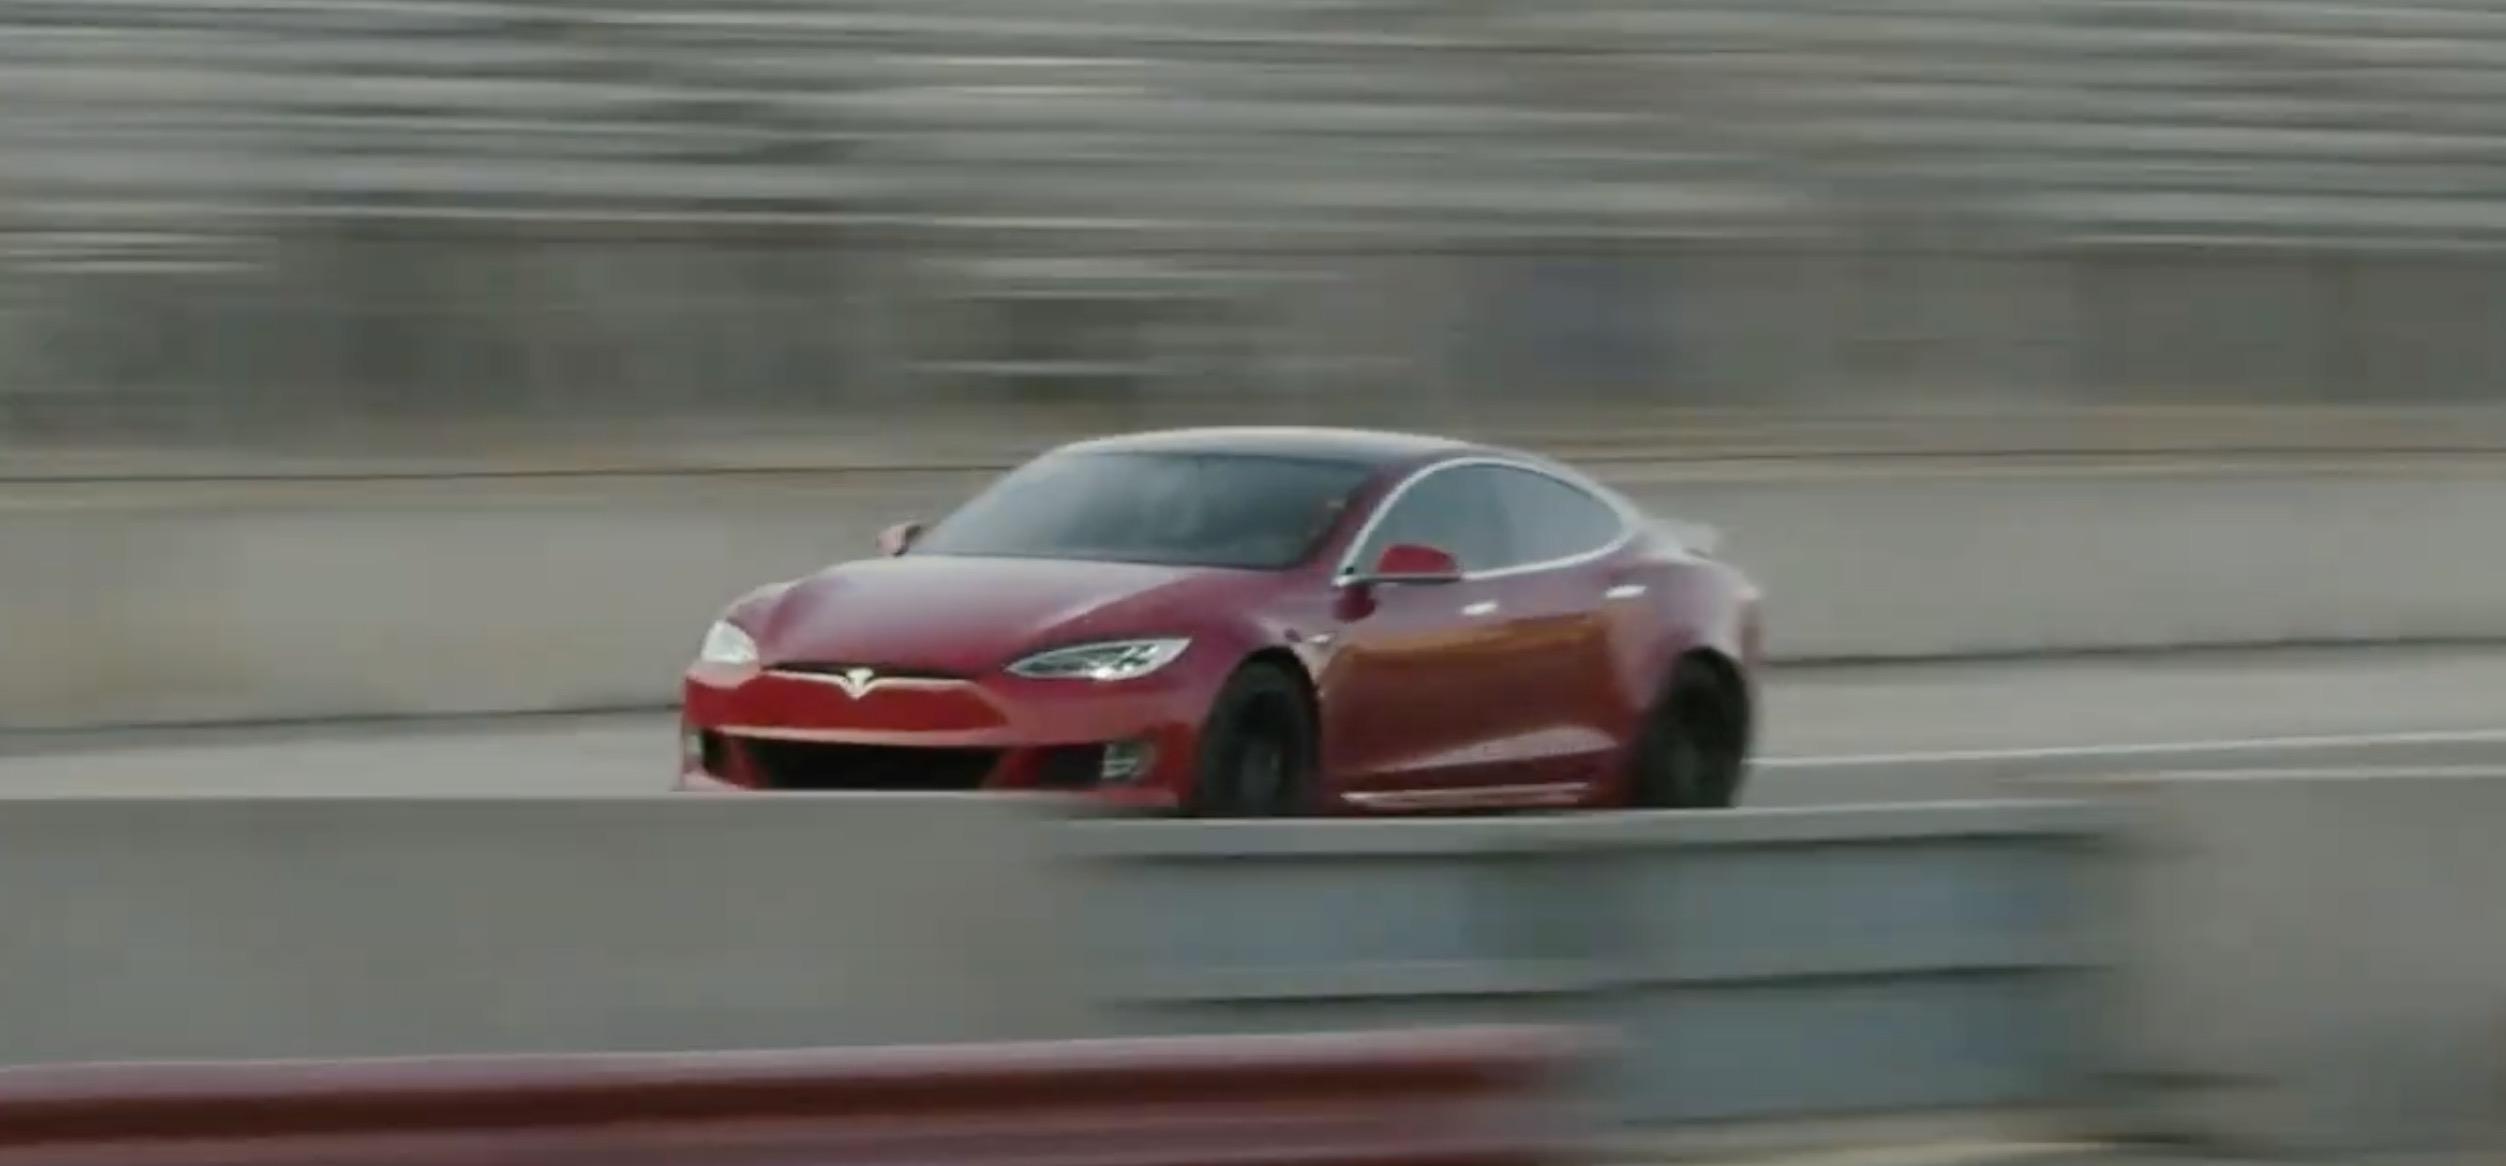 Tesla Model S plaid hero jpg?quality=82&strip=all